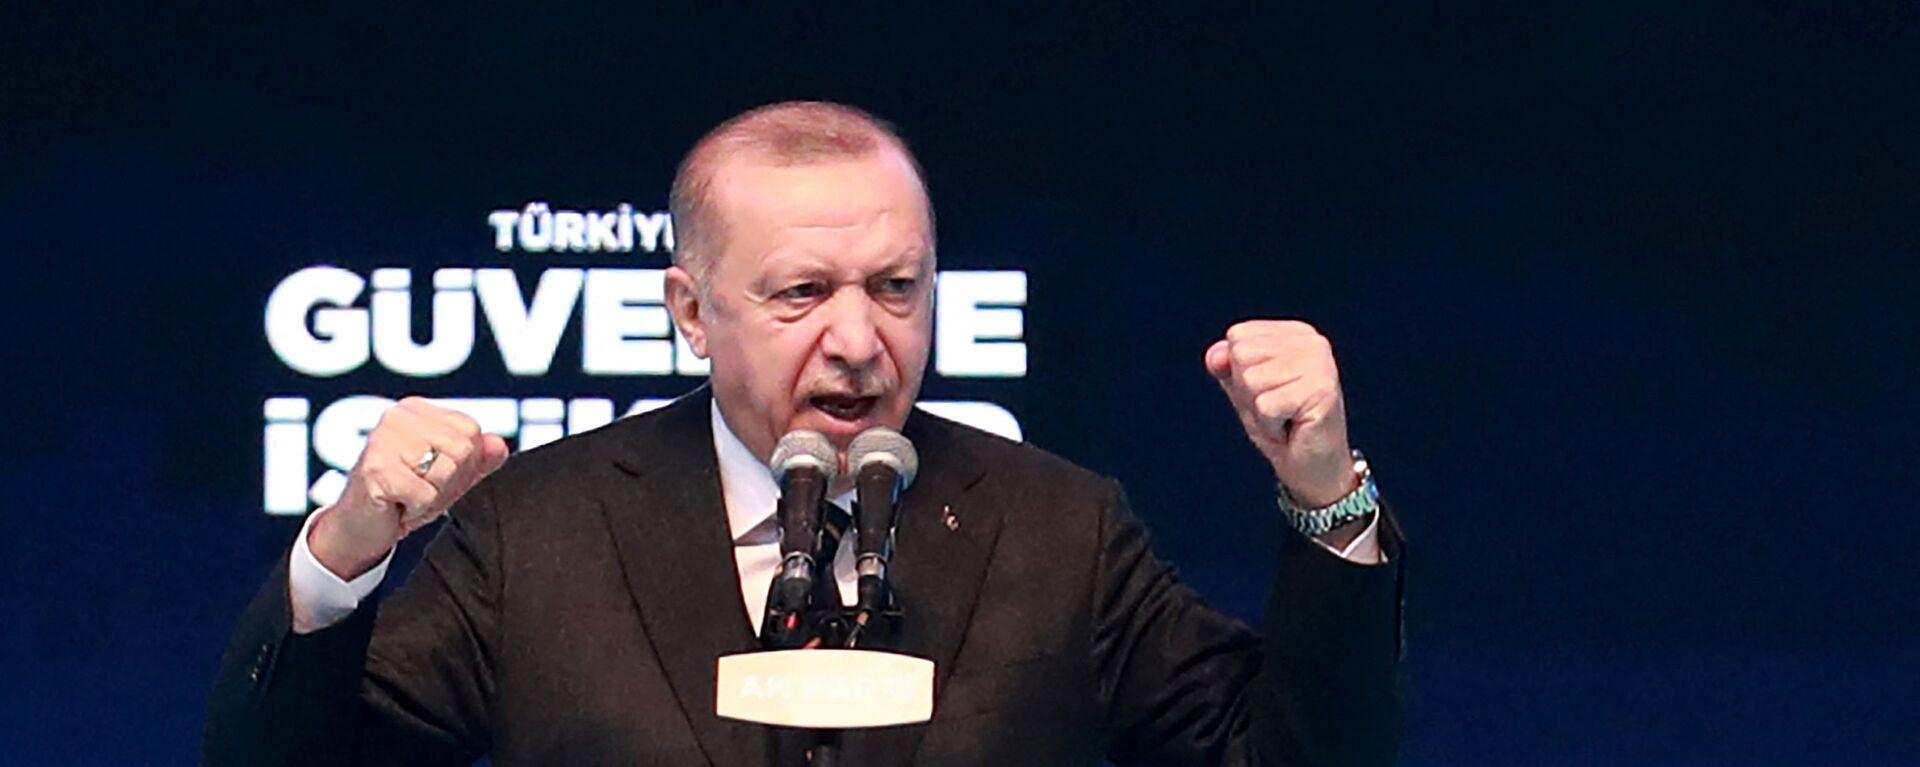 Predsednik Turske Redžep Tajip Erdogan - Sputnik Srbija, 1920, 25.08.2021